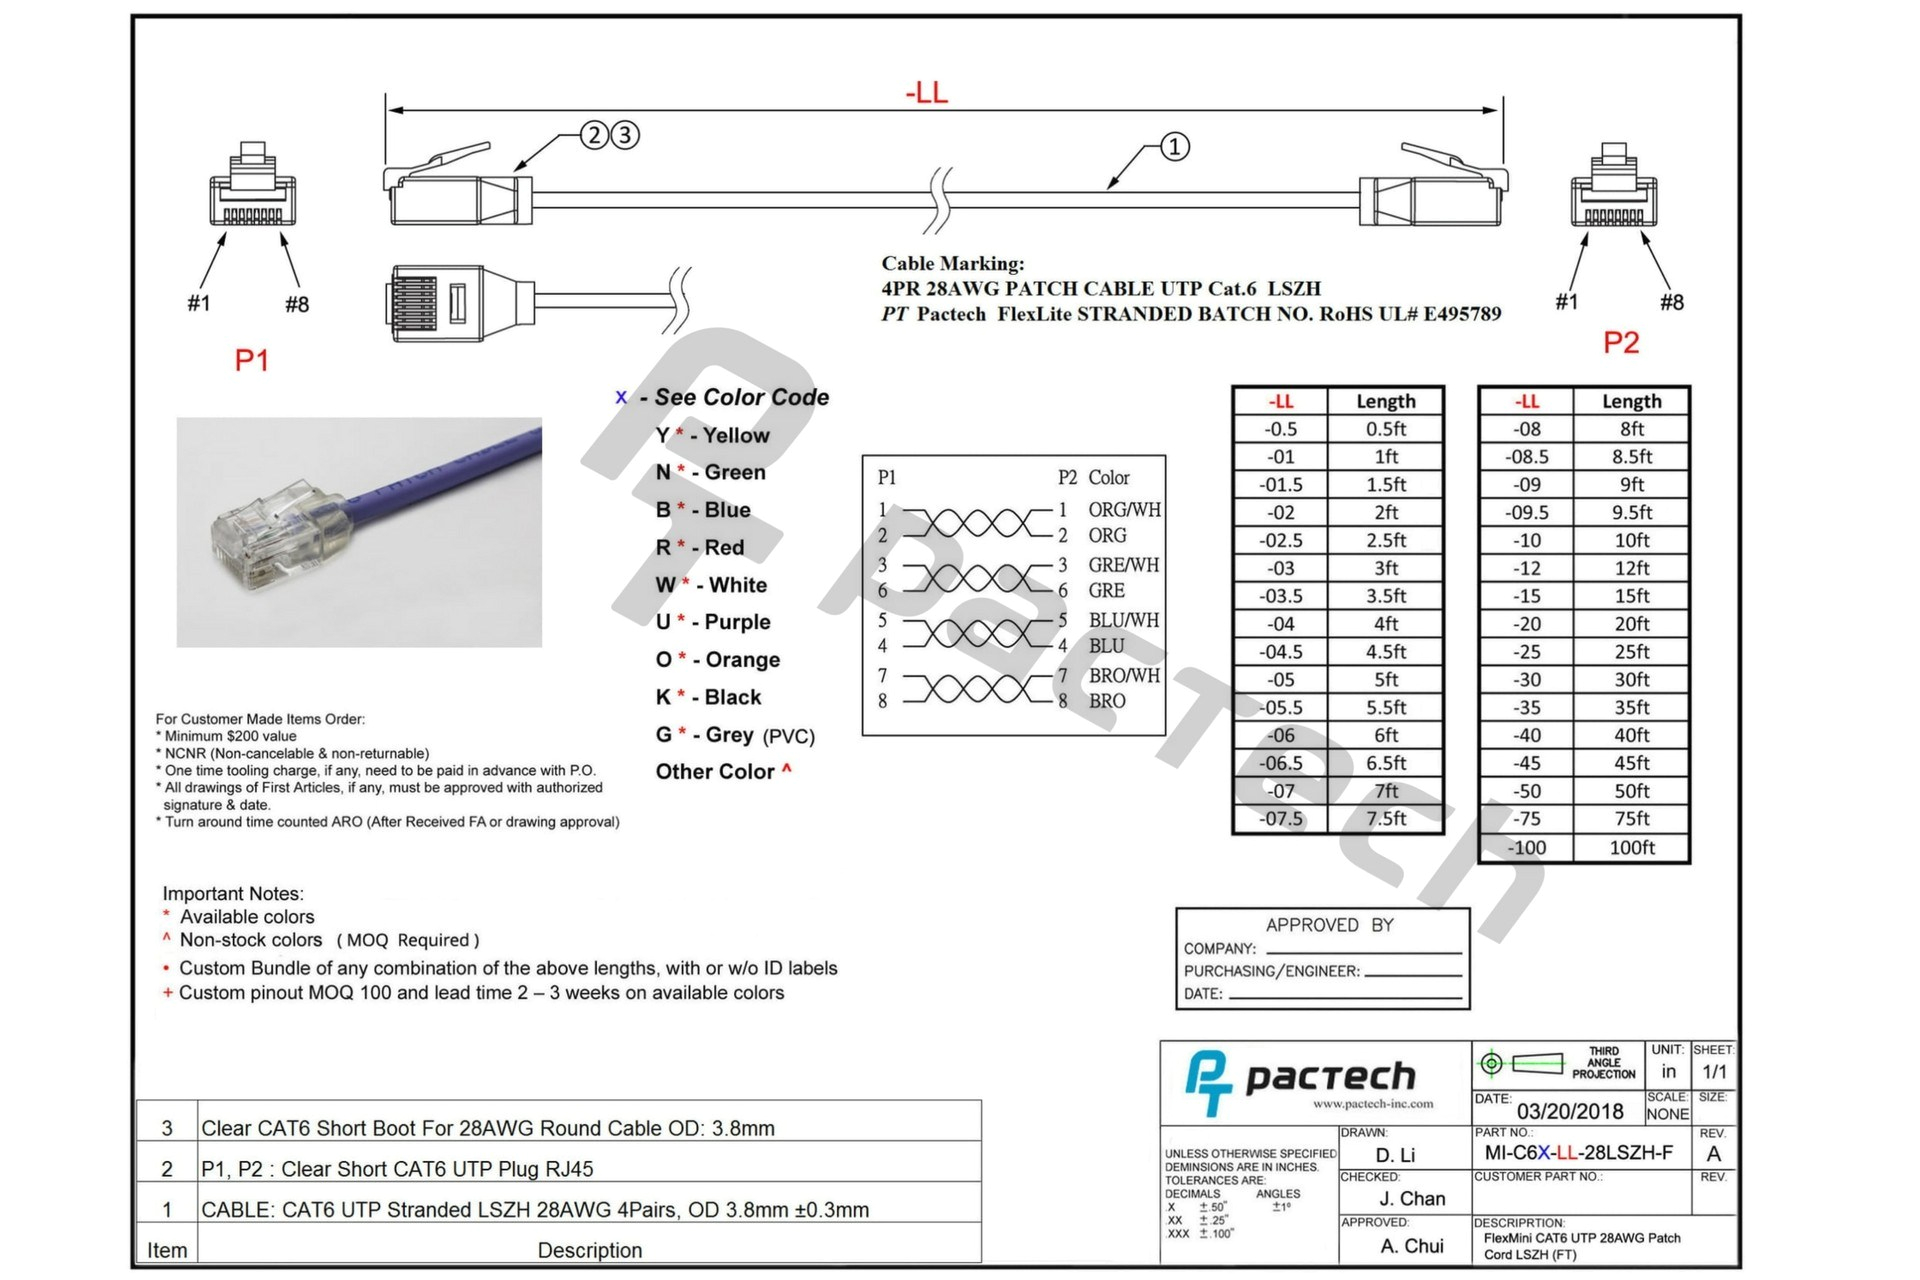 cat 6 wiring diagram wikipedia wiring diagram name rj45 wiring diagram wikipedia